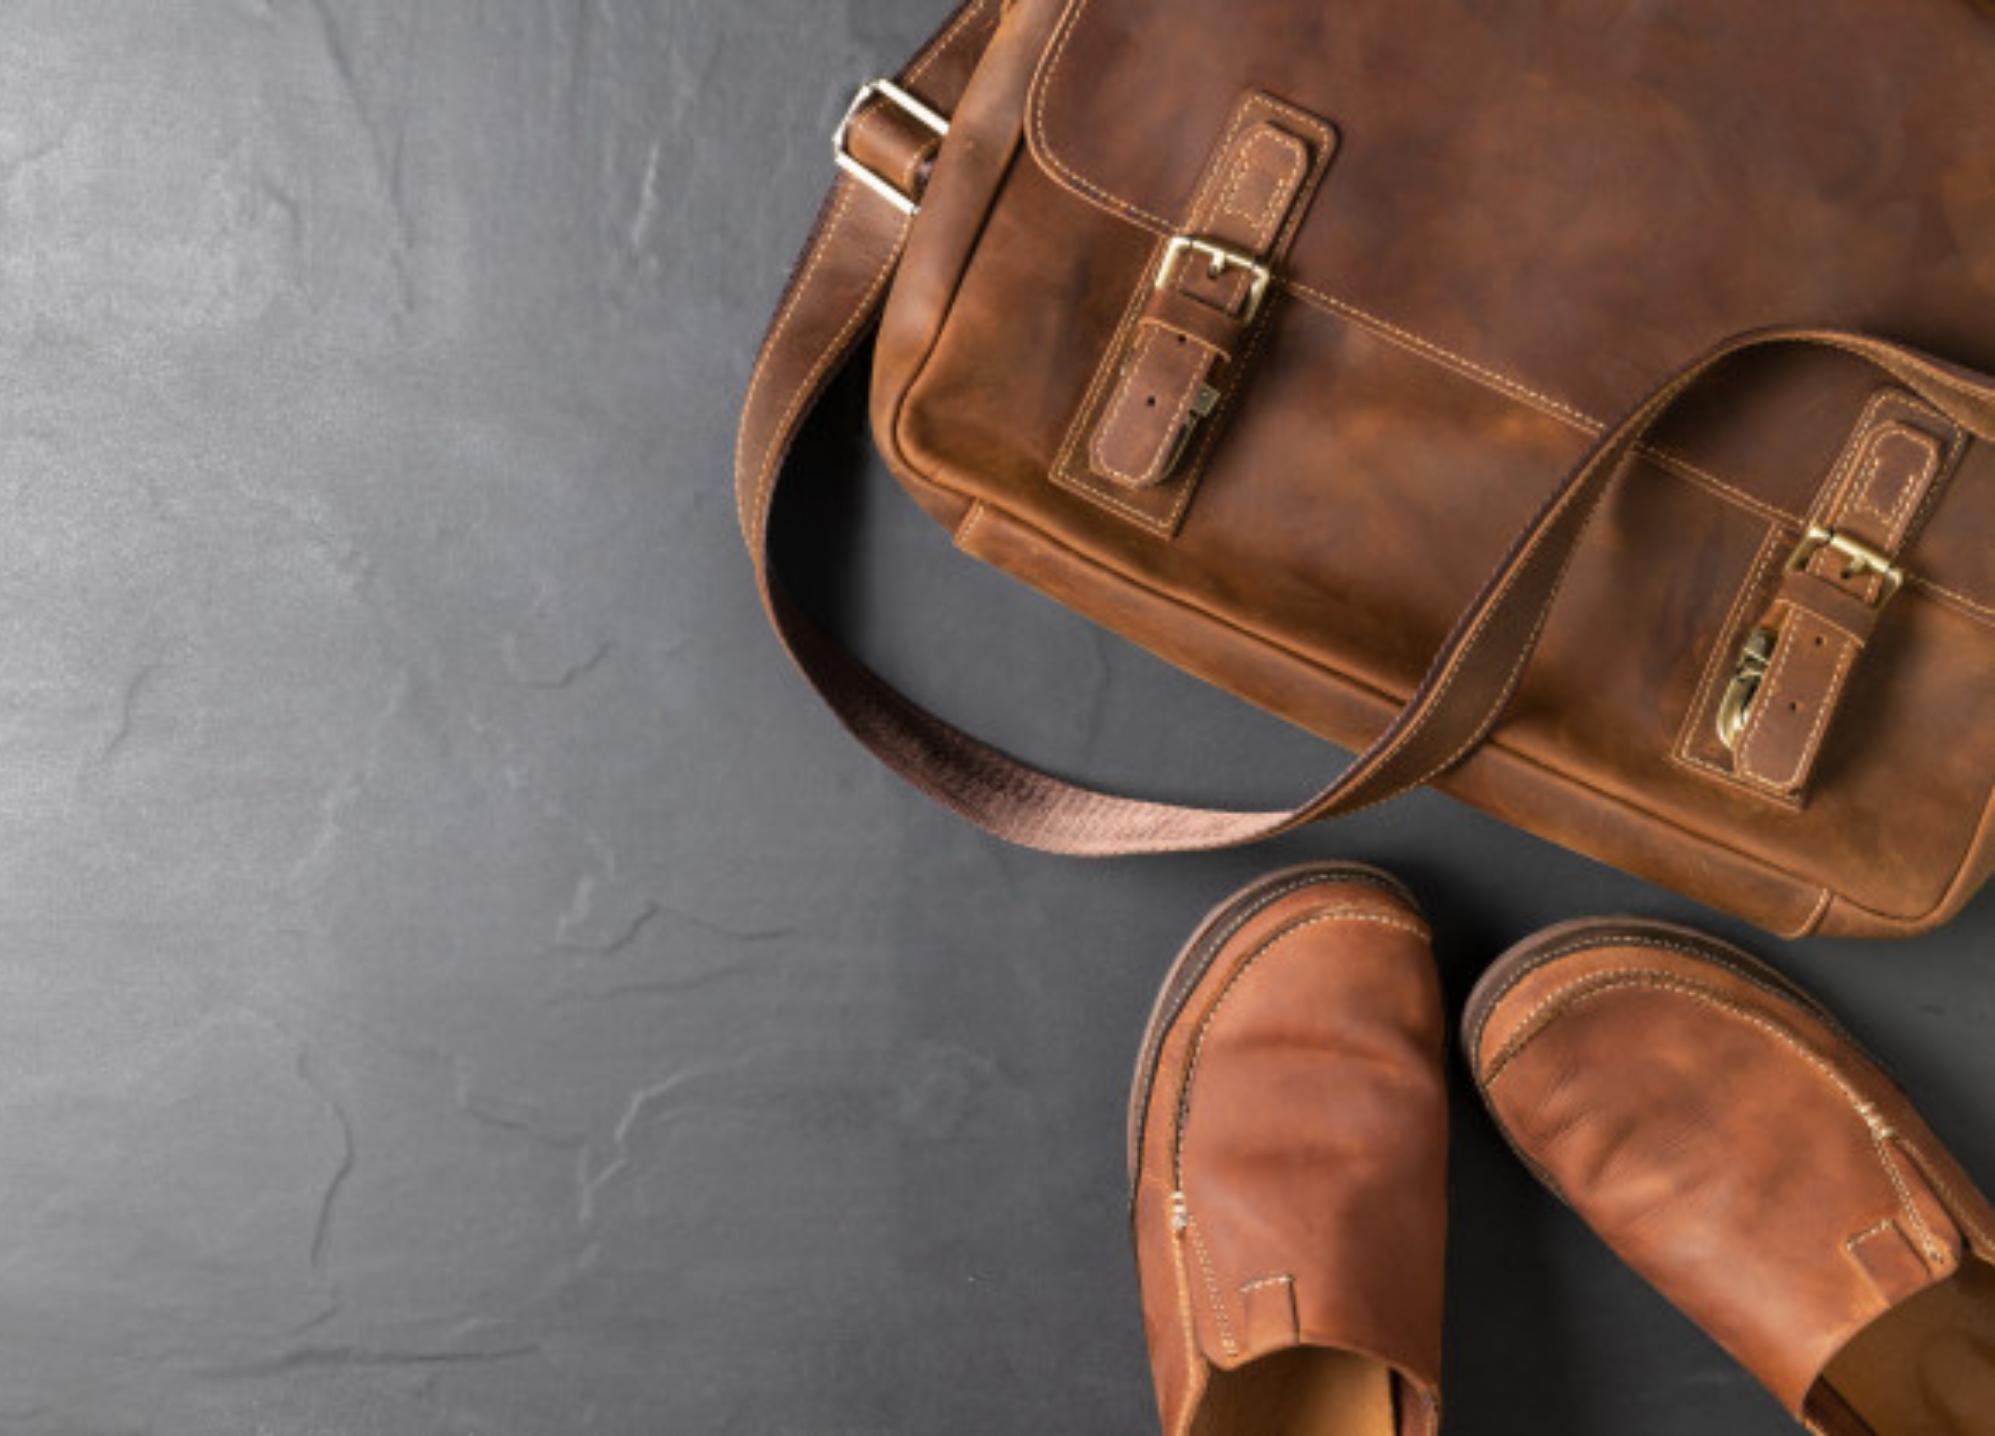 WHY EVERYONE SHOULD OWN A CAMO MESSENGER BAG